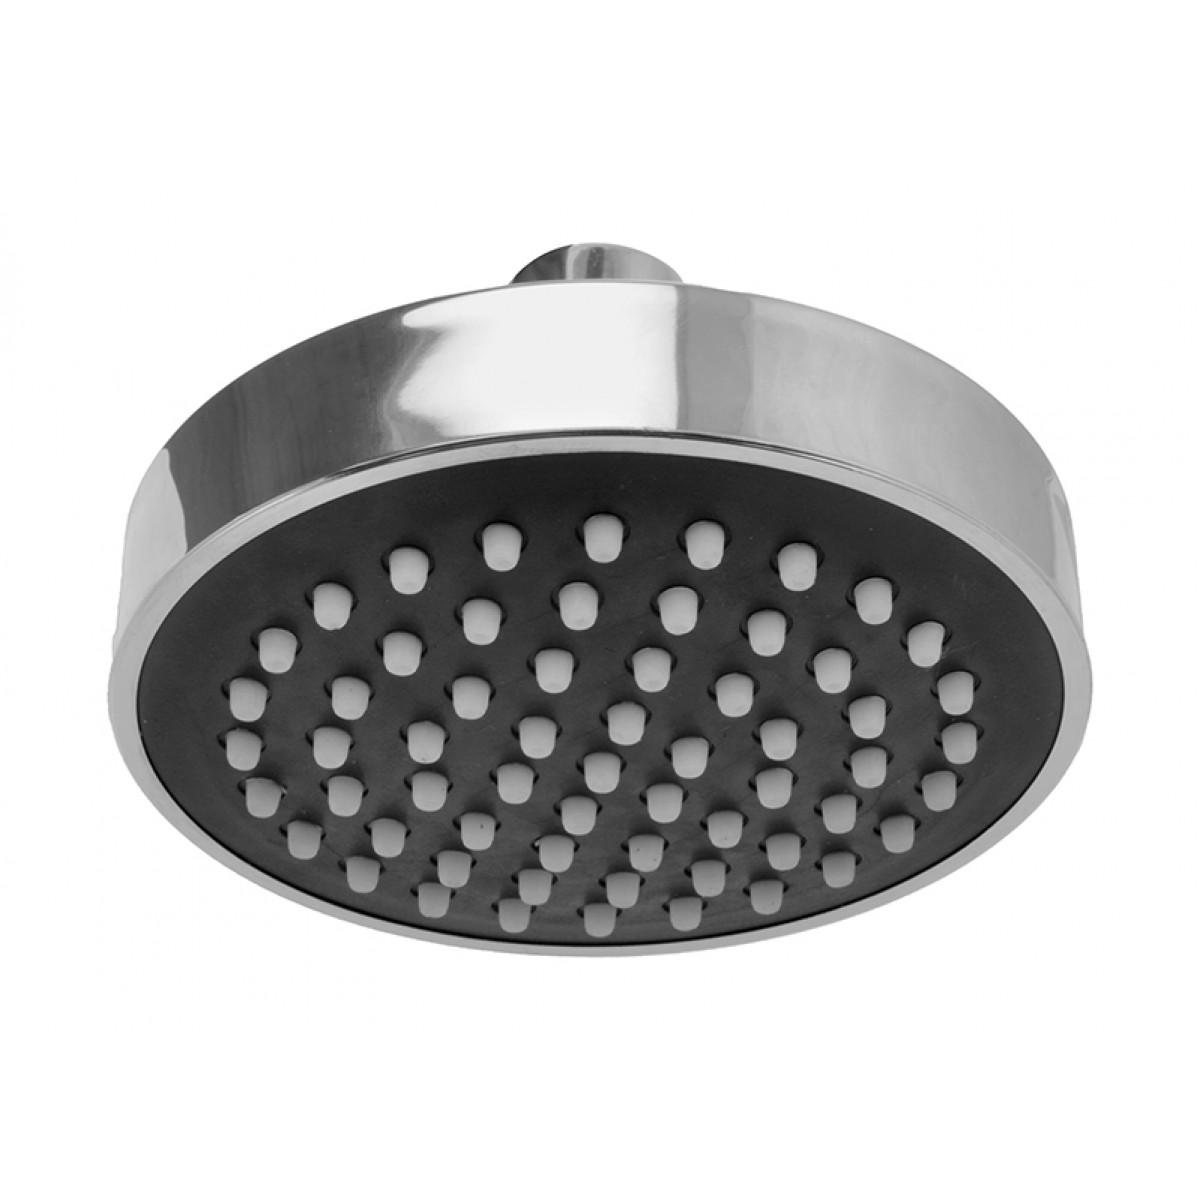 Buy Online Bathroom Shower Head - ABS Shower Head - 19x6x5 - Moon ...